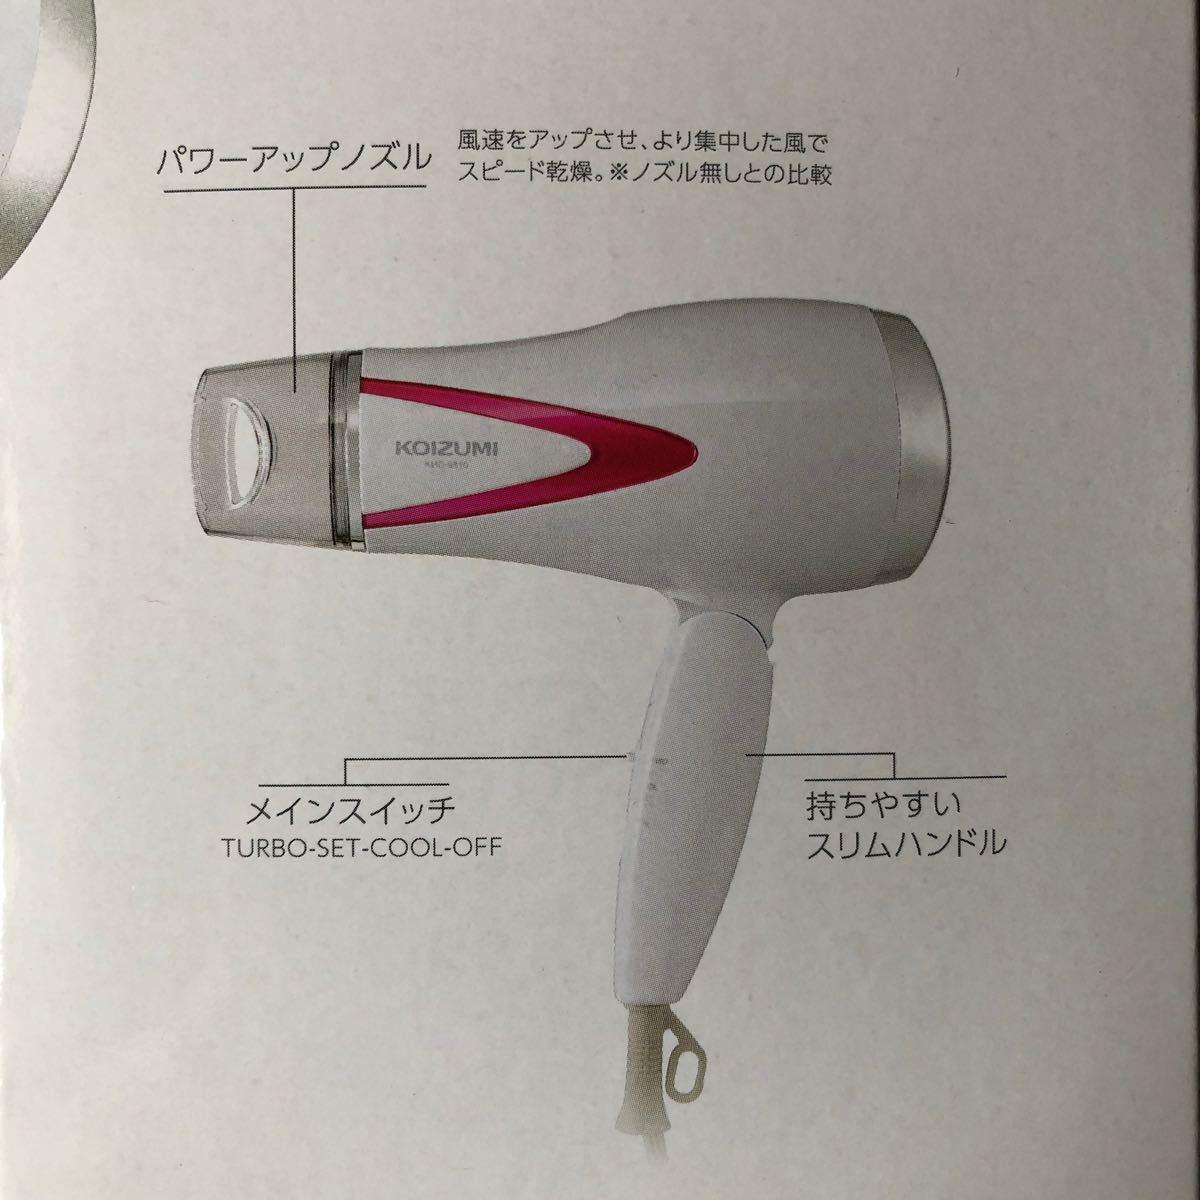 KOIZUMI マイナスイオンカーリングドライヤー マイナスイオンヘアドライヤー